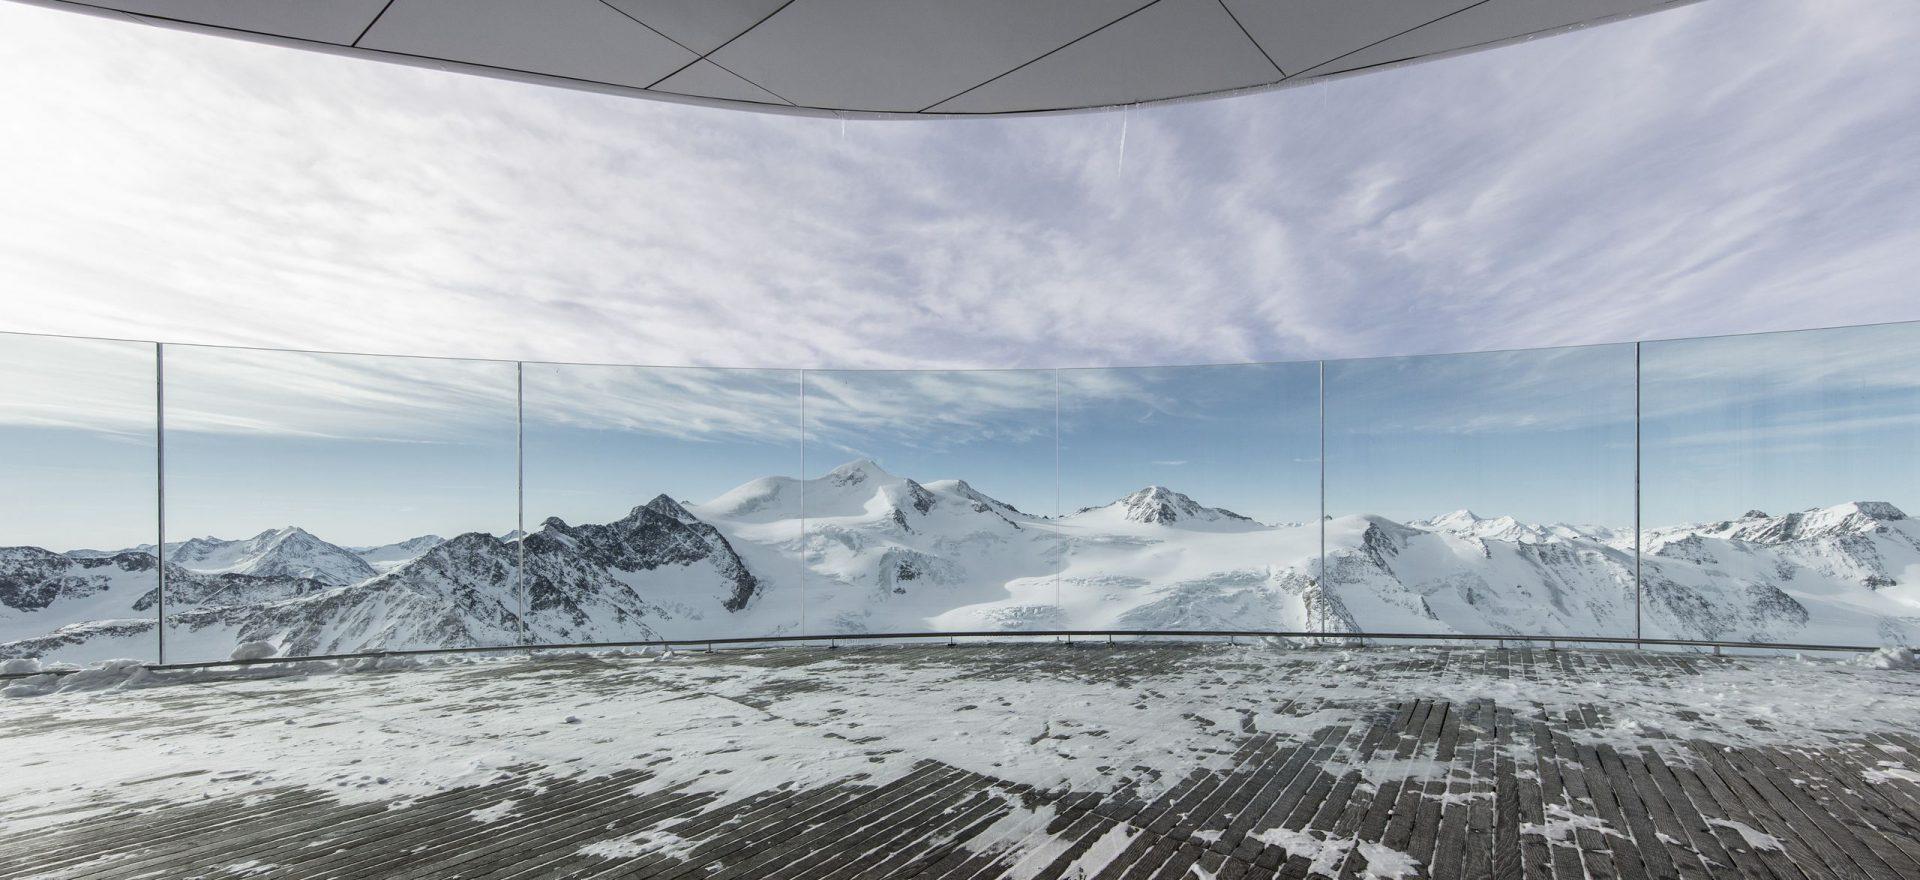 Wildspitzbahn Pitztal © Tirol Werbung / Sailer Gregor